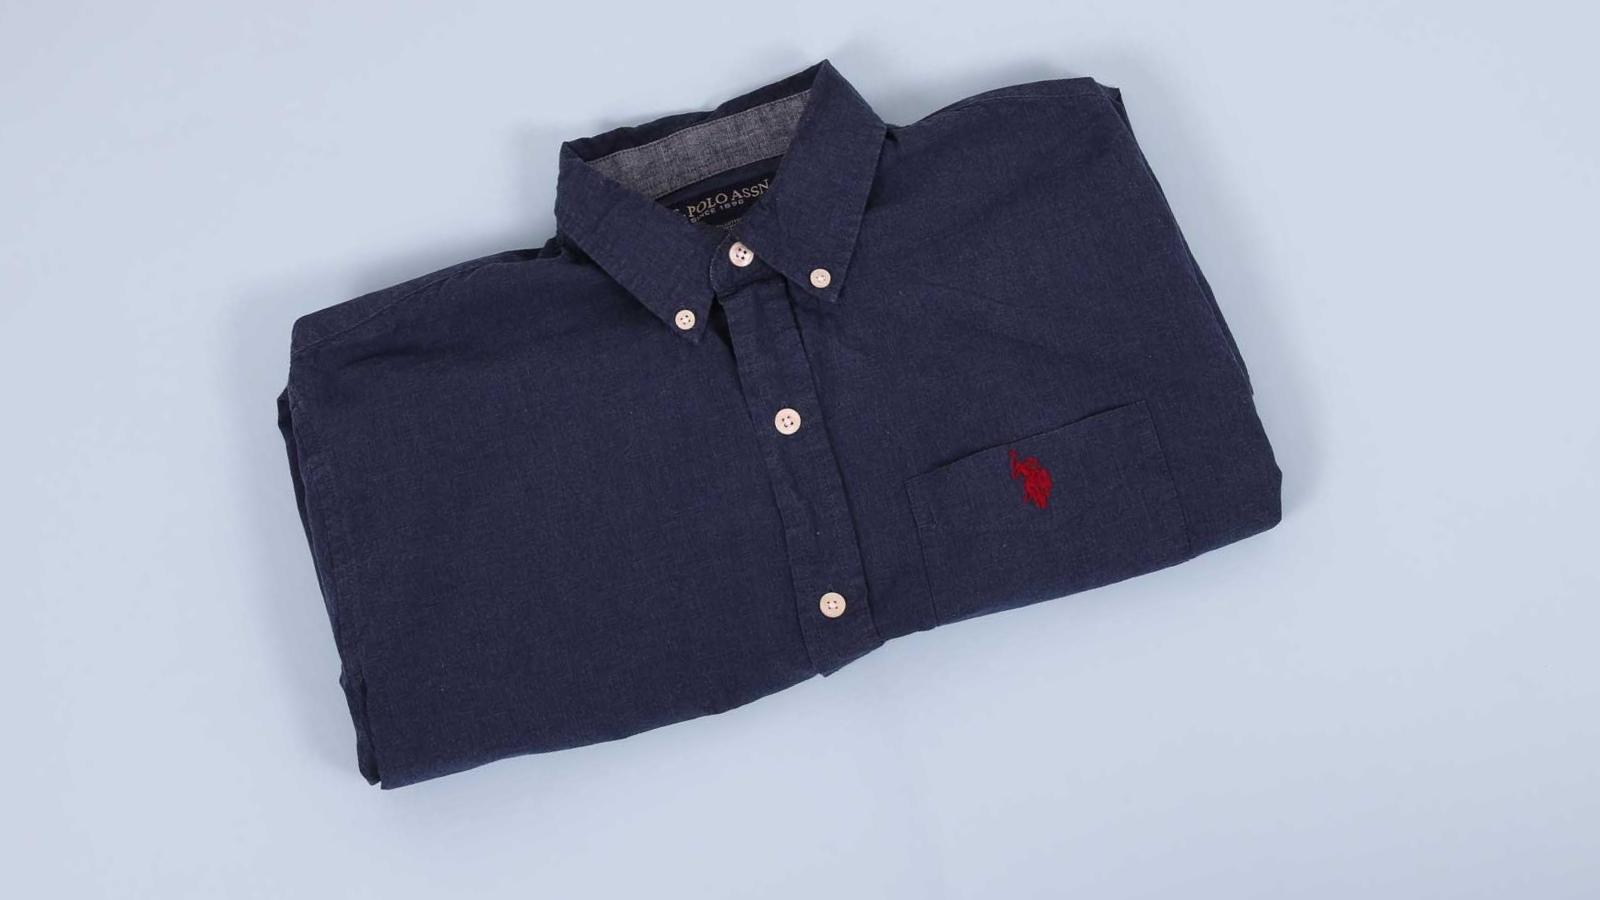 How to Fold any Long Sleeve Shirt the Right Way